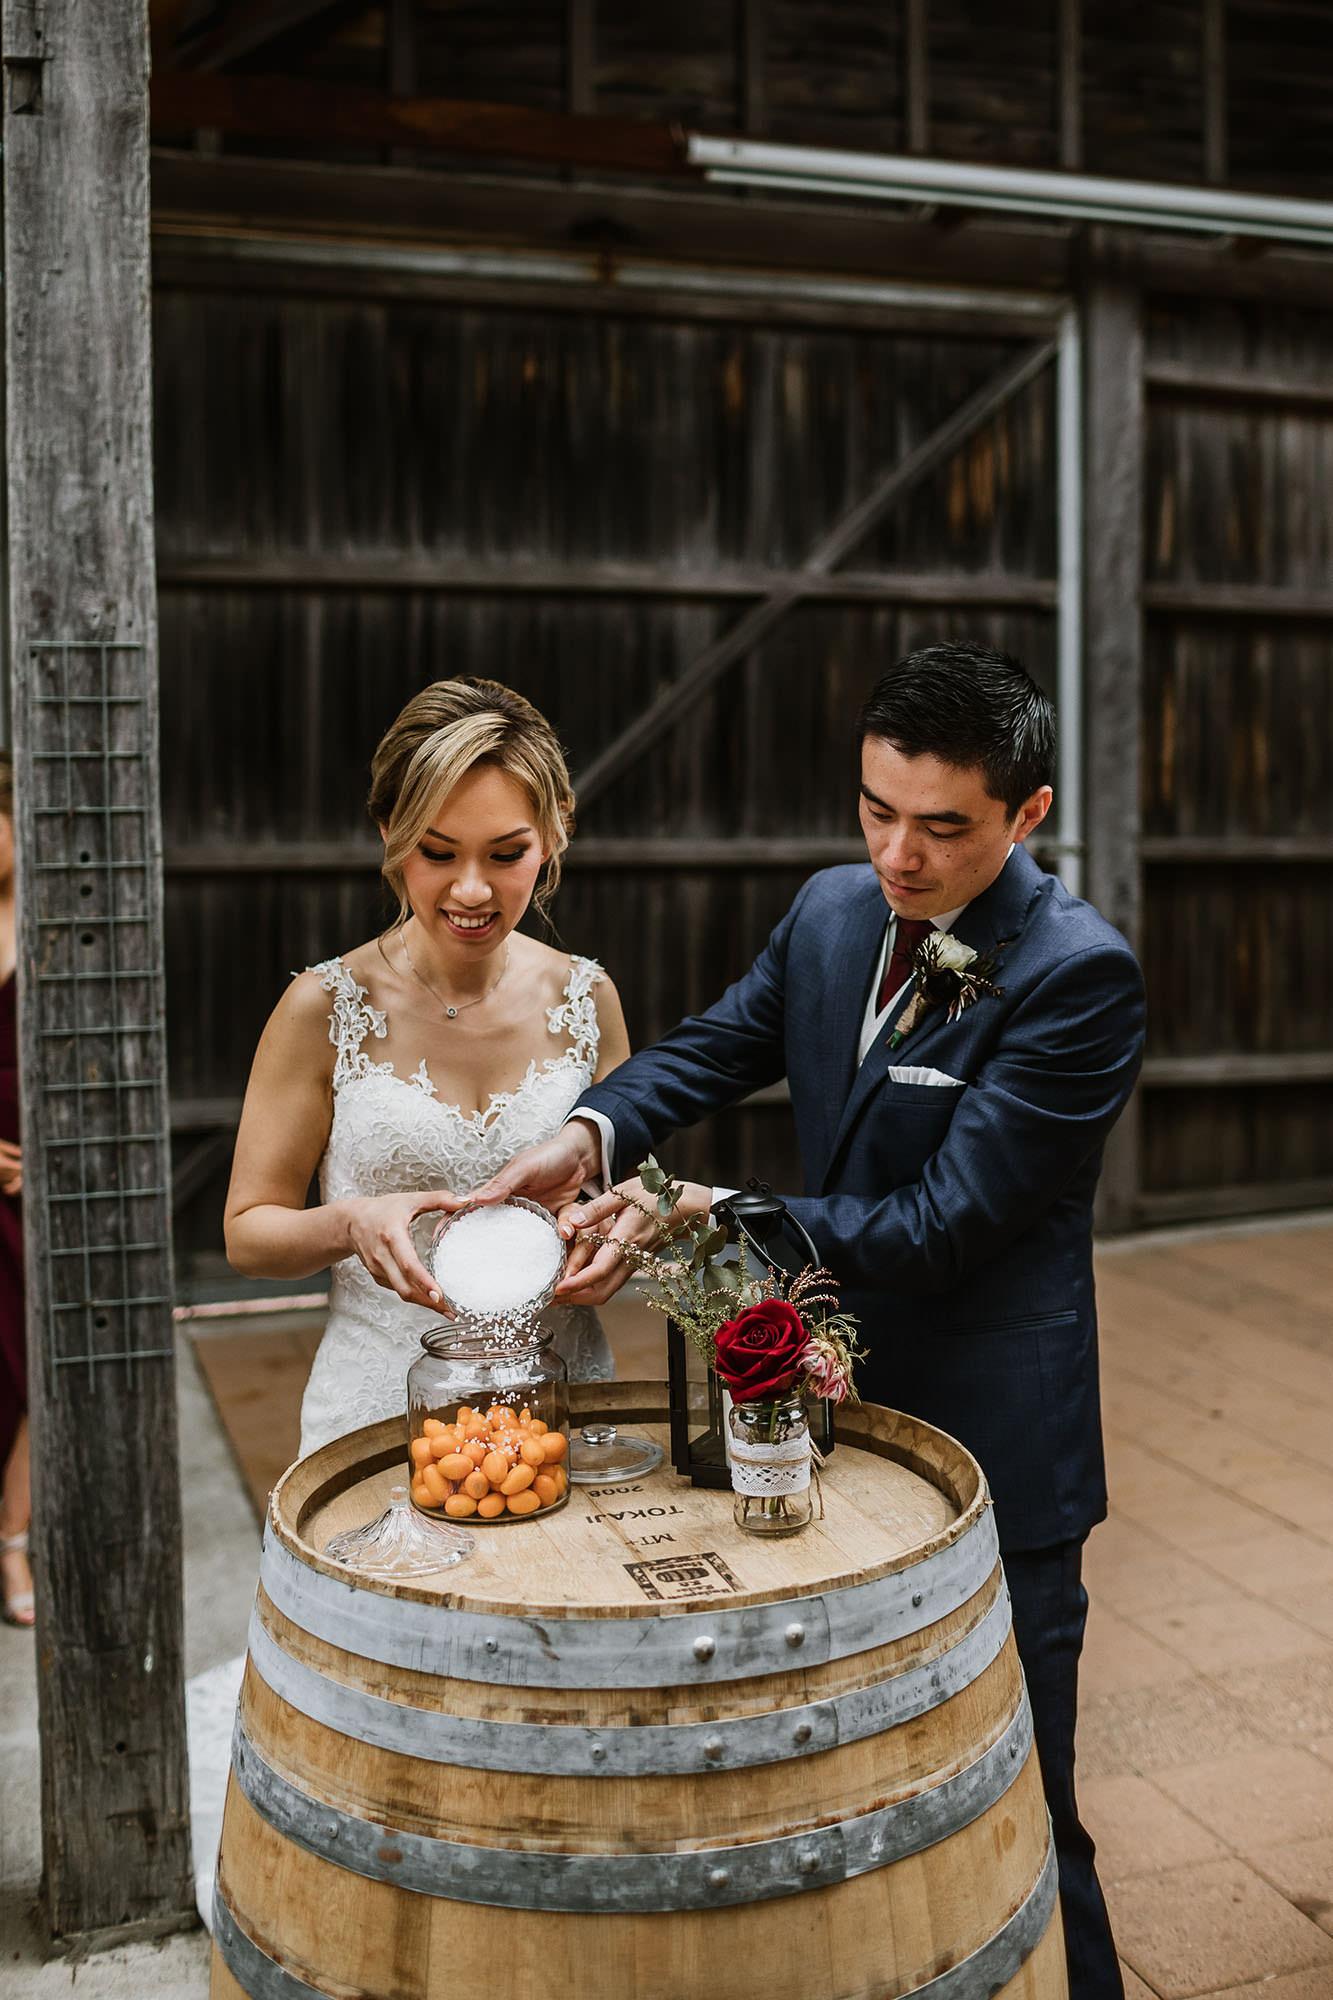 kumquat with salt wedding ceremony